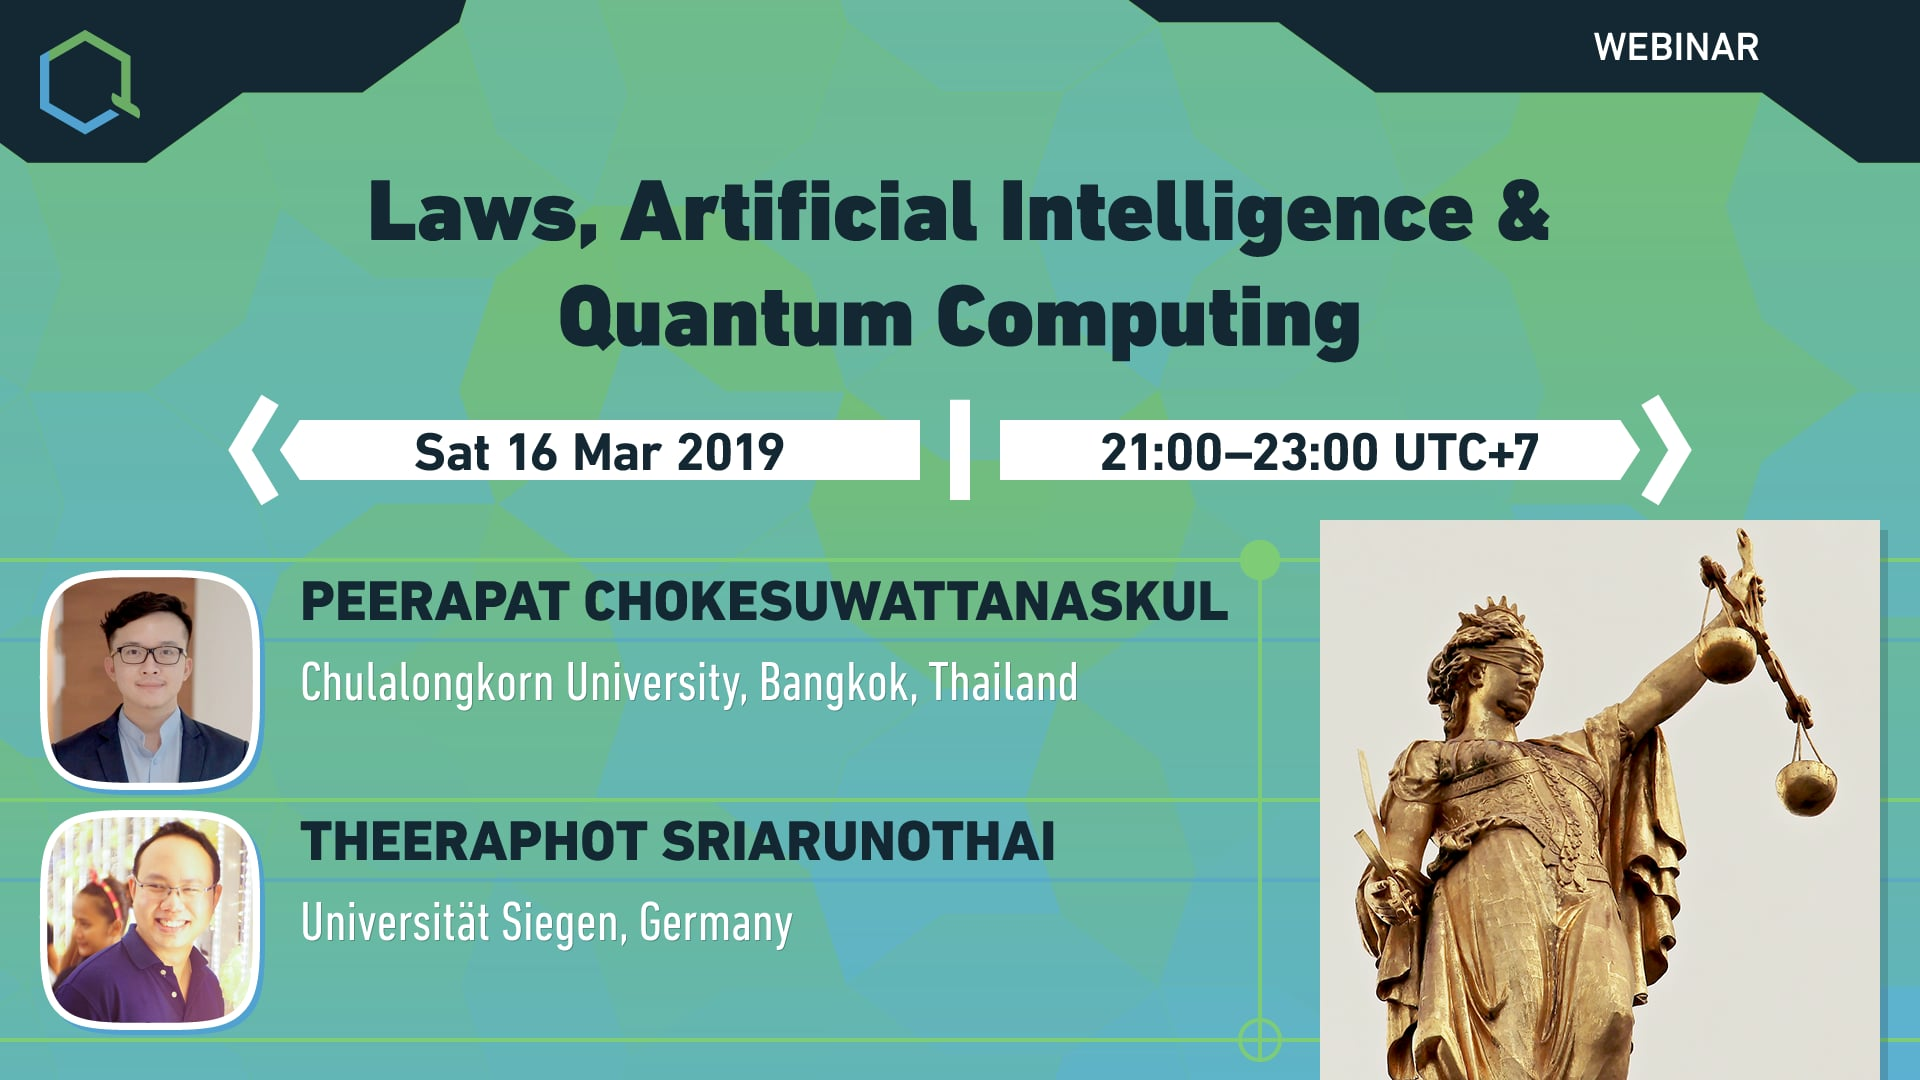 Laws, Artificial Intelligence & Quantum Computing